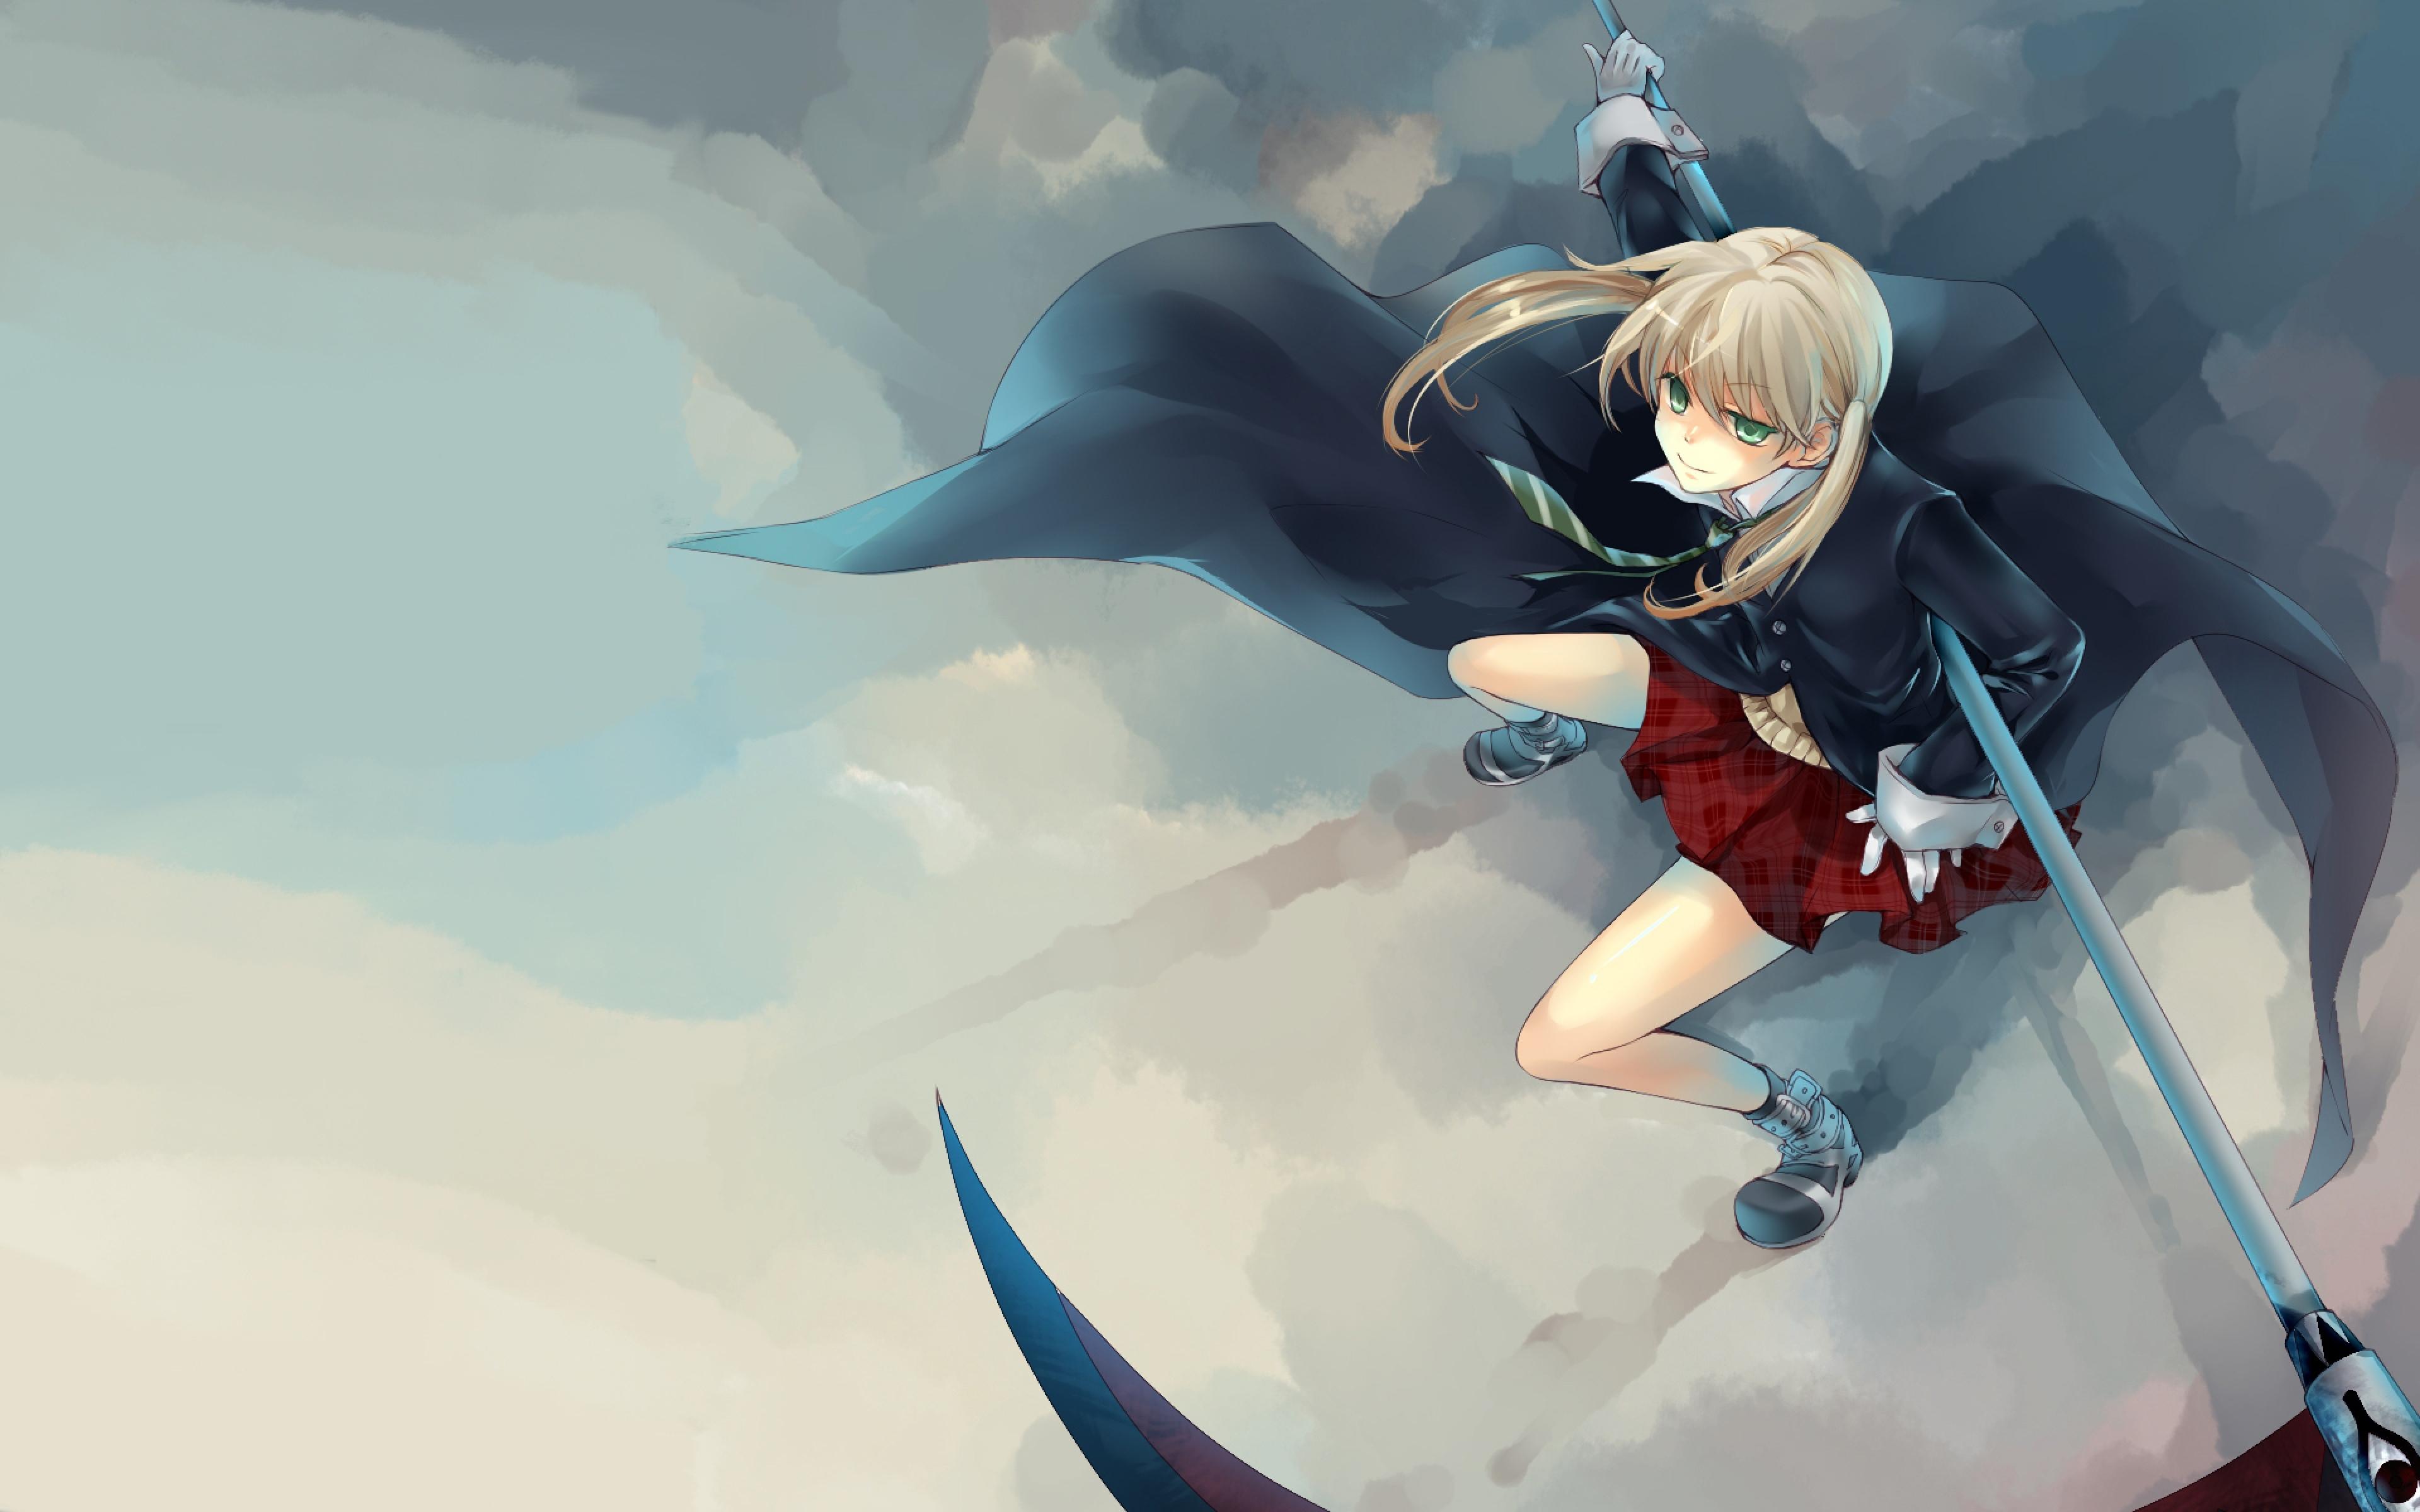 Download Wallpaper 3840x2400 Anime Girl Air Guns Coat Commitment 3840x2400